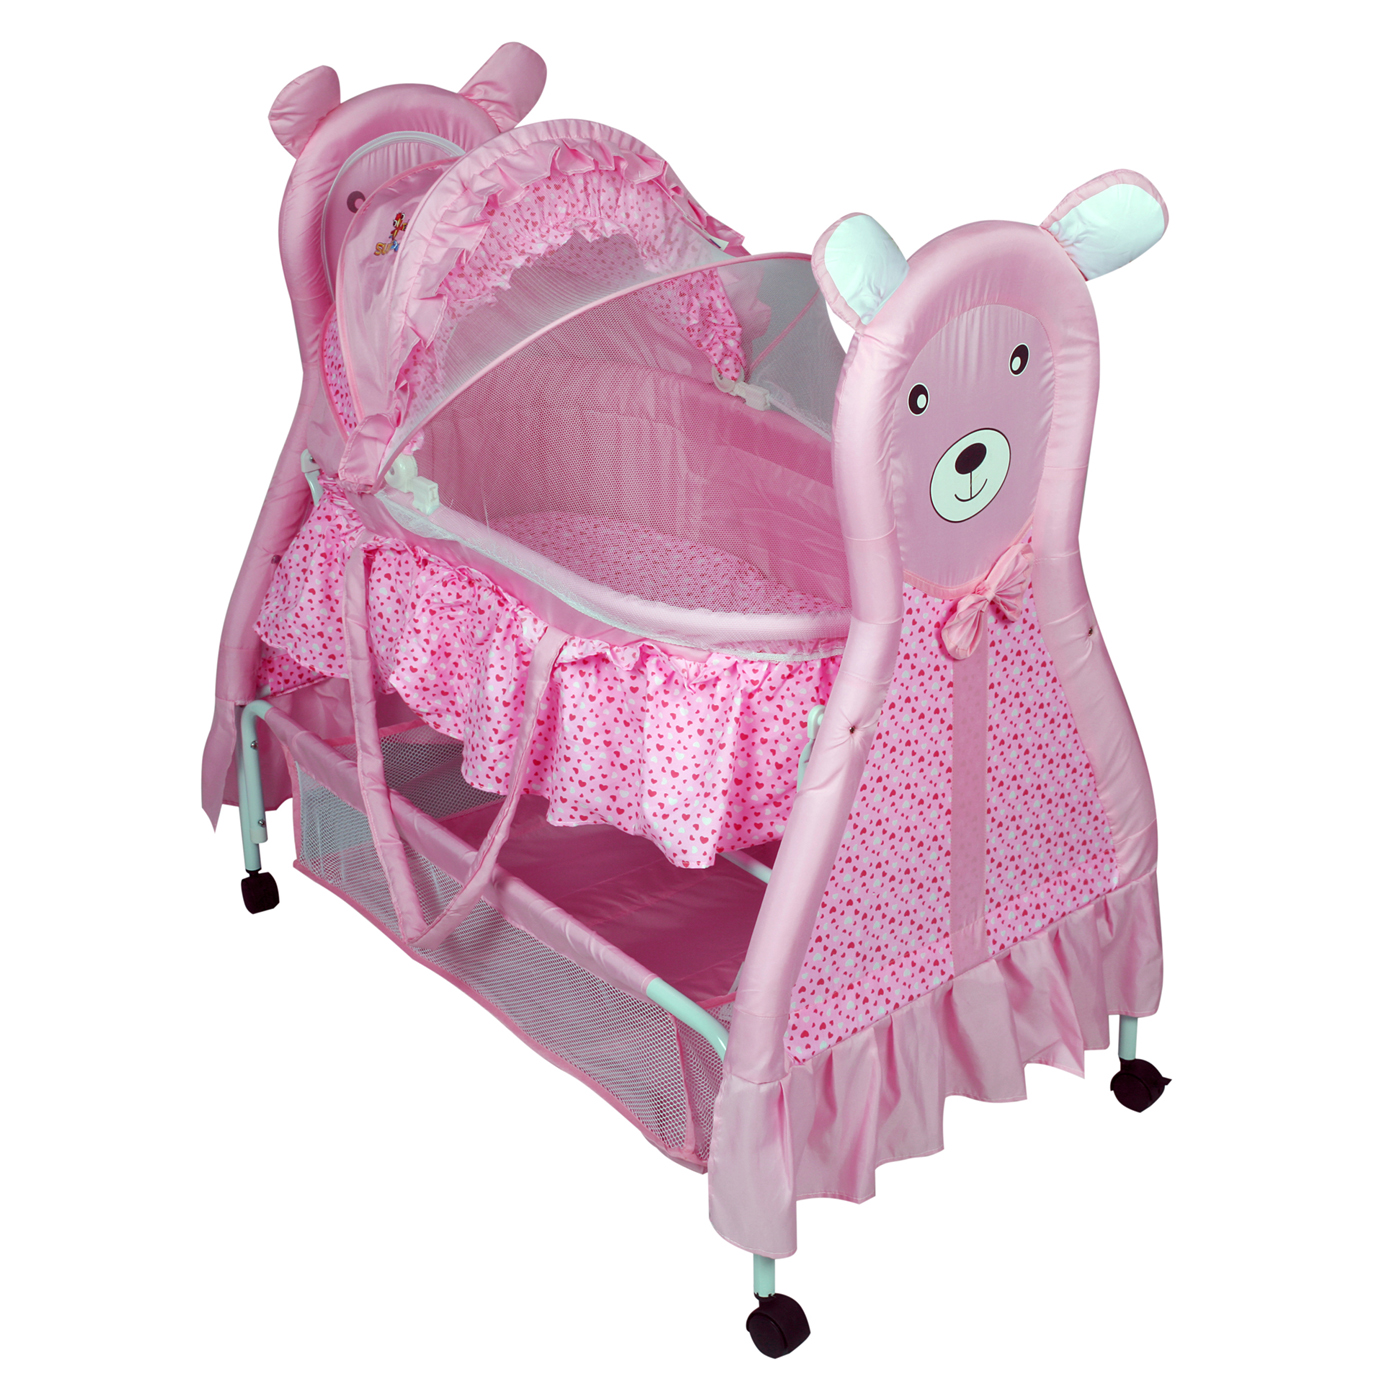 Baby bed online flipkart - Baby Bear Bassinet Buy Infant Rocking Musical Bassinets Online In India